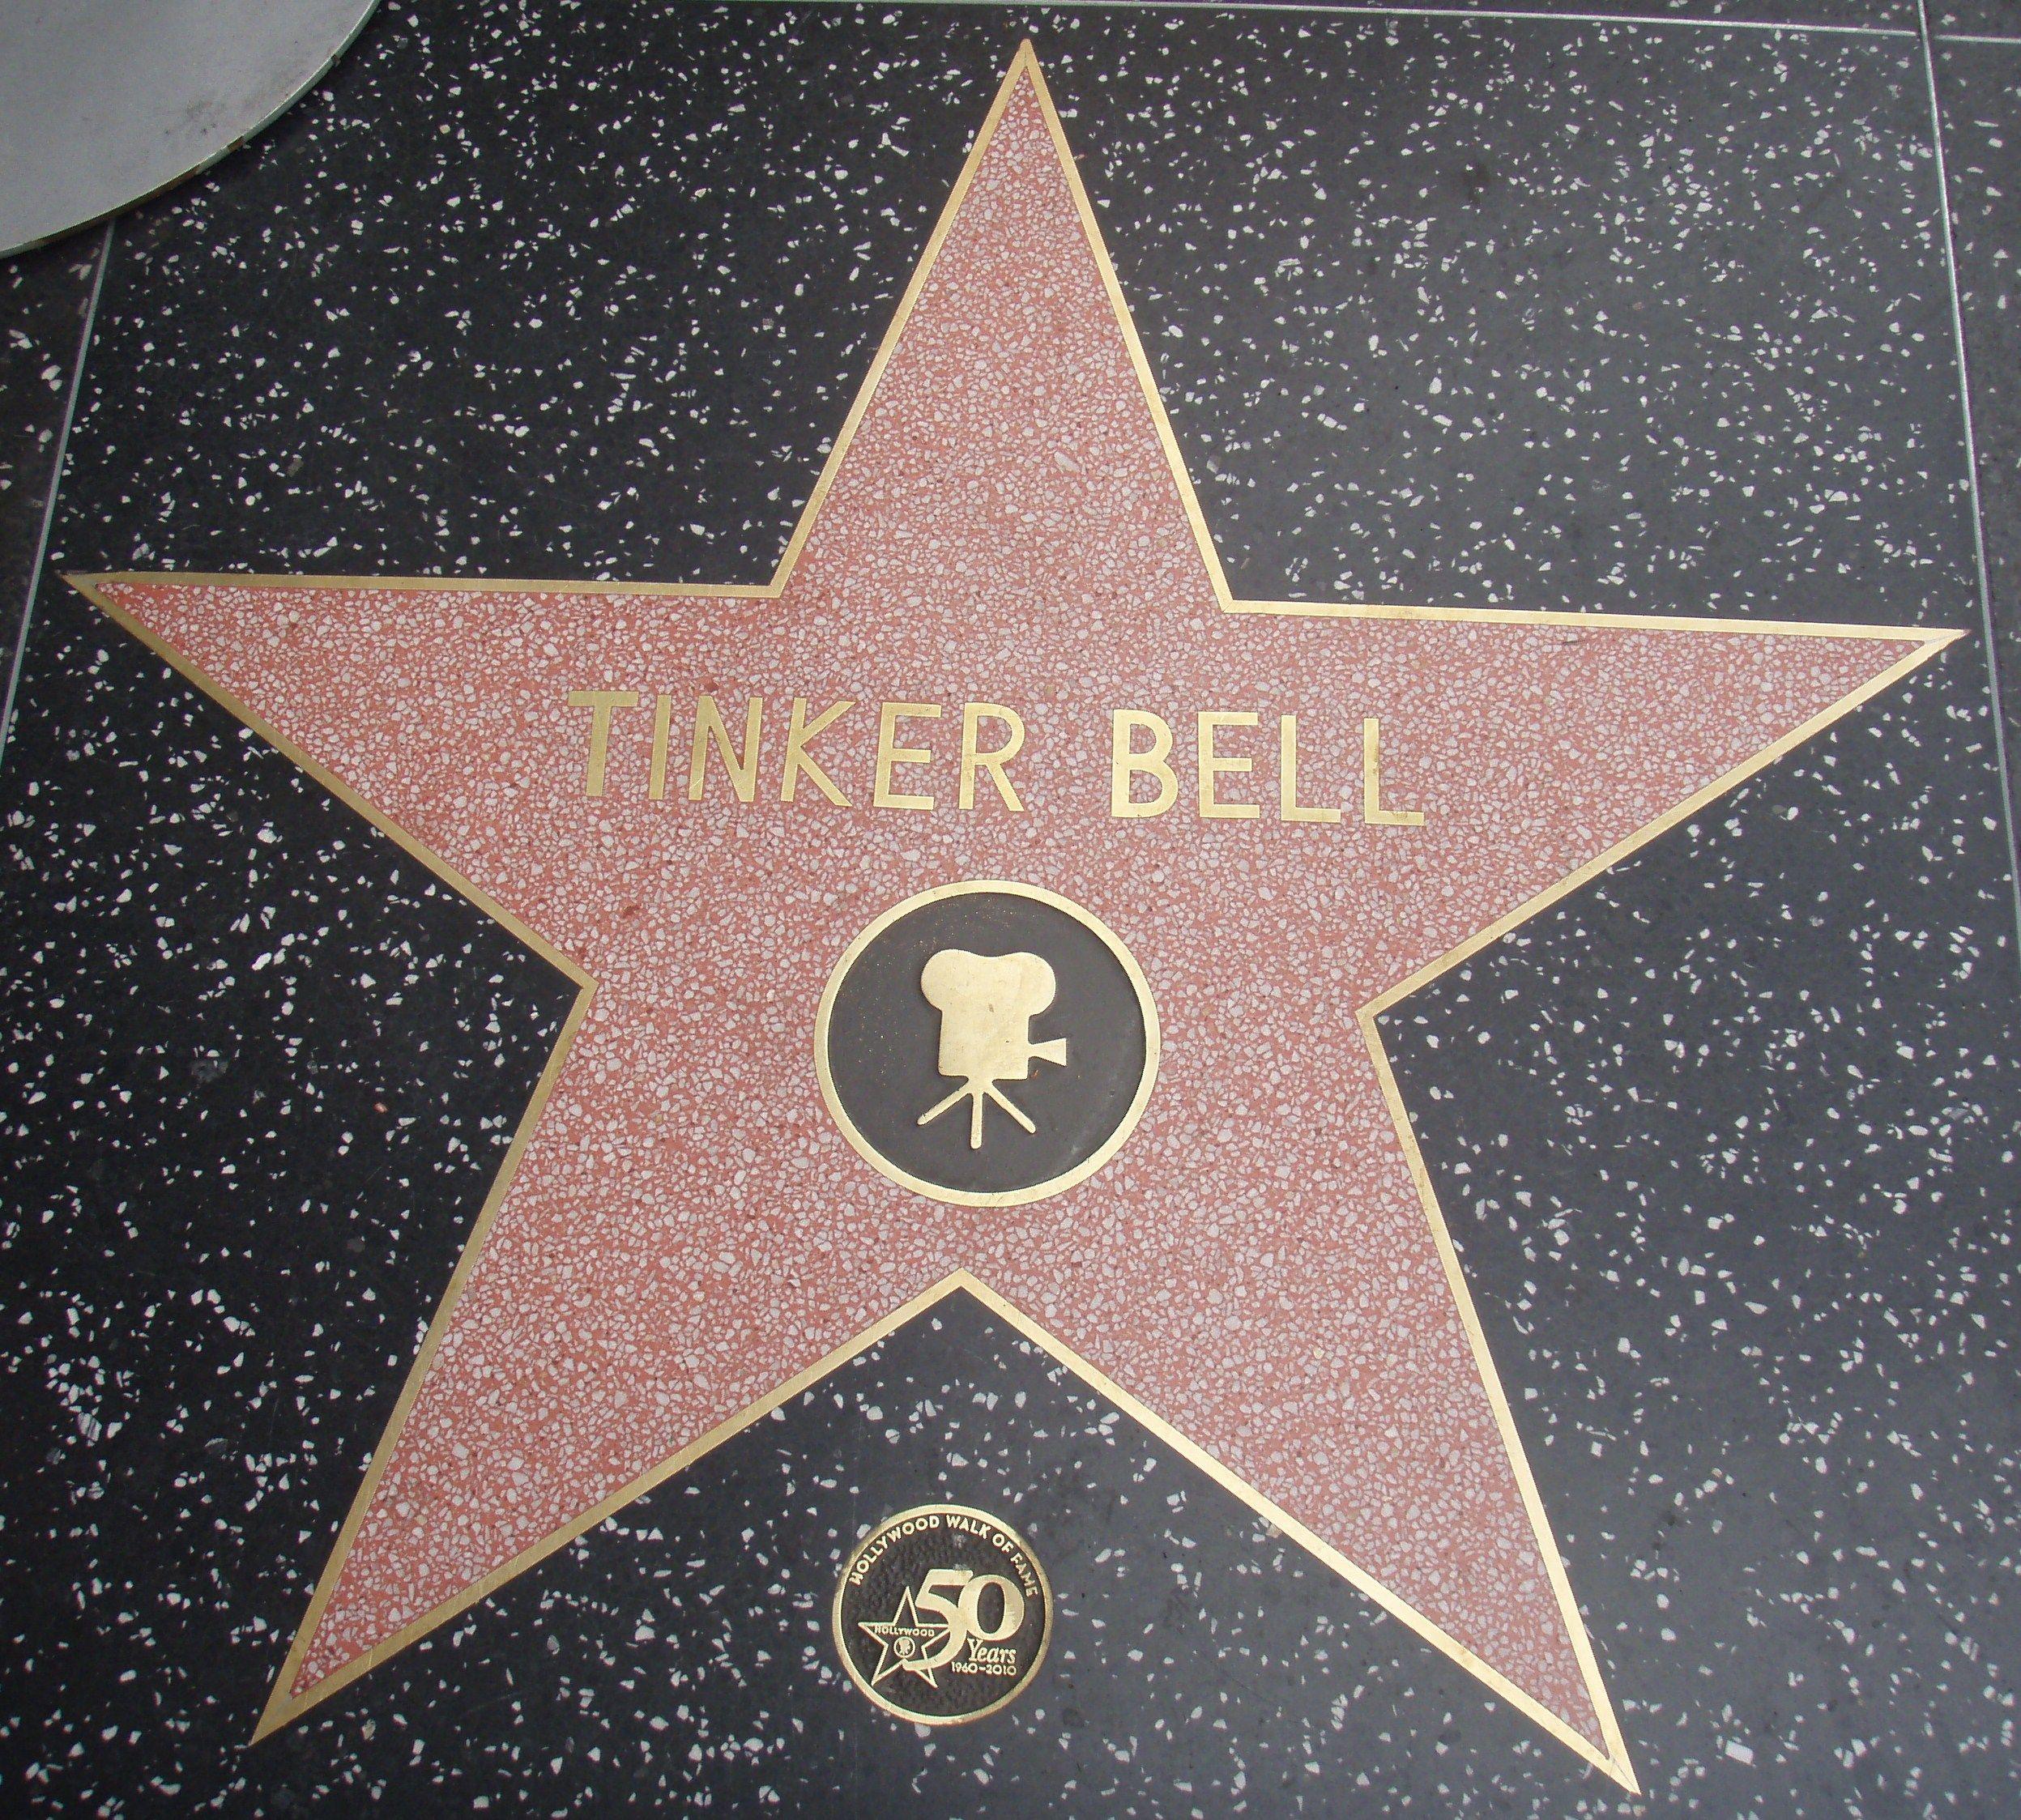 Картинка голливудской звезды